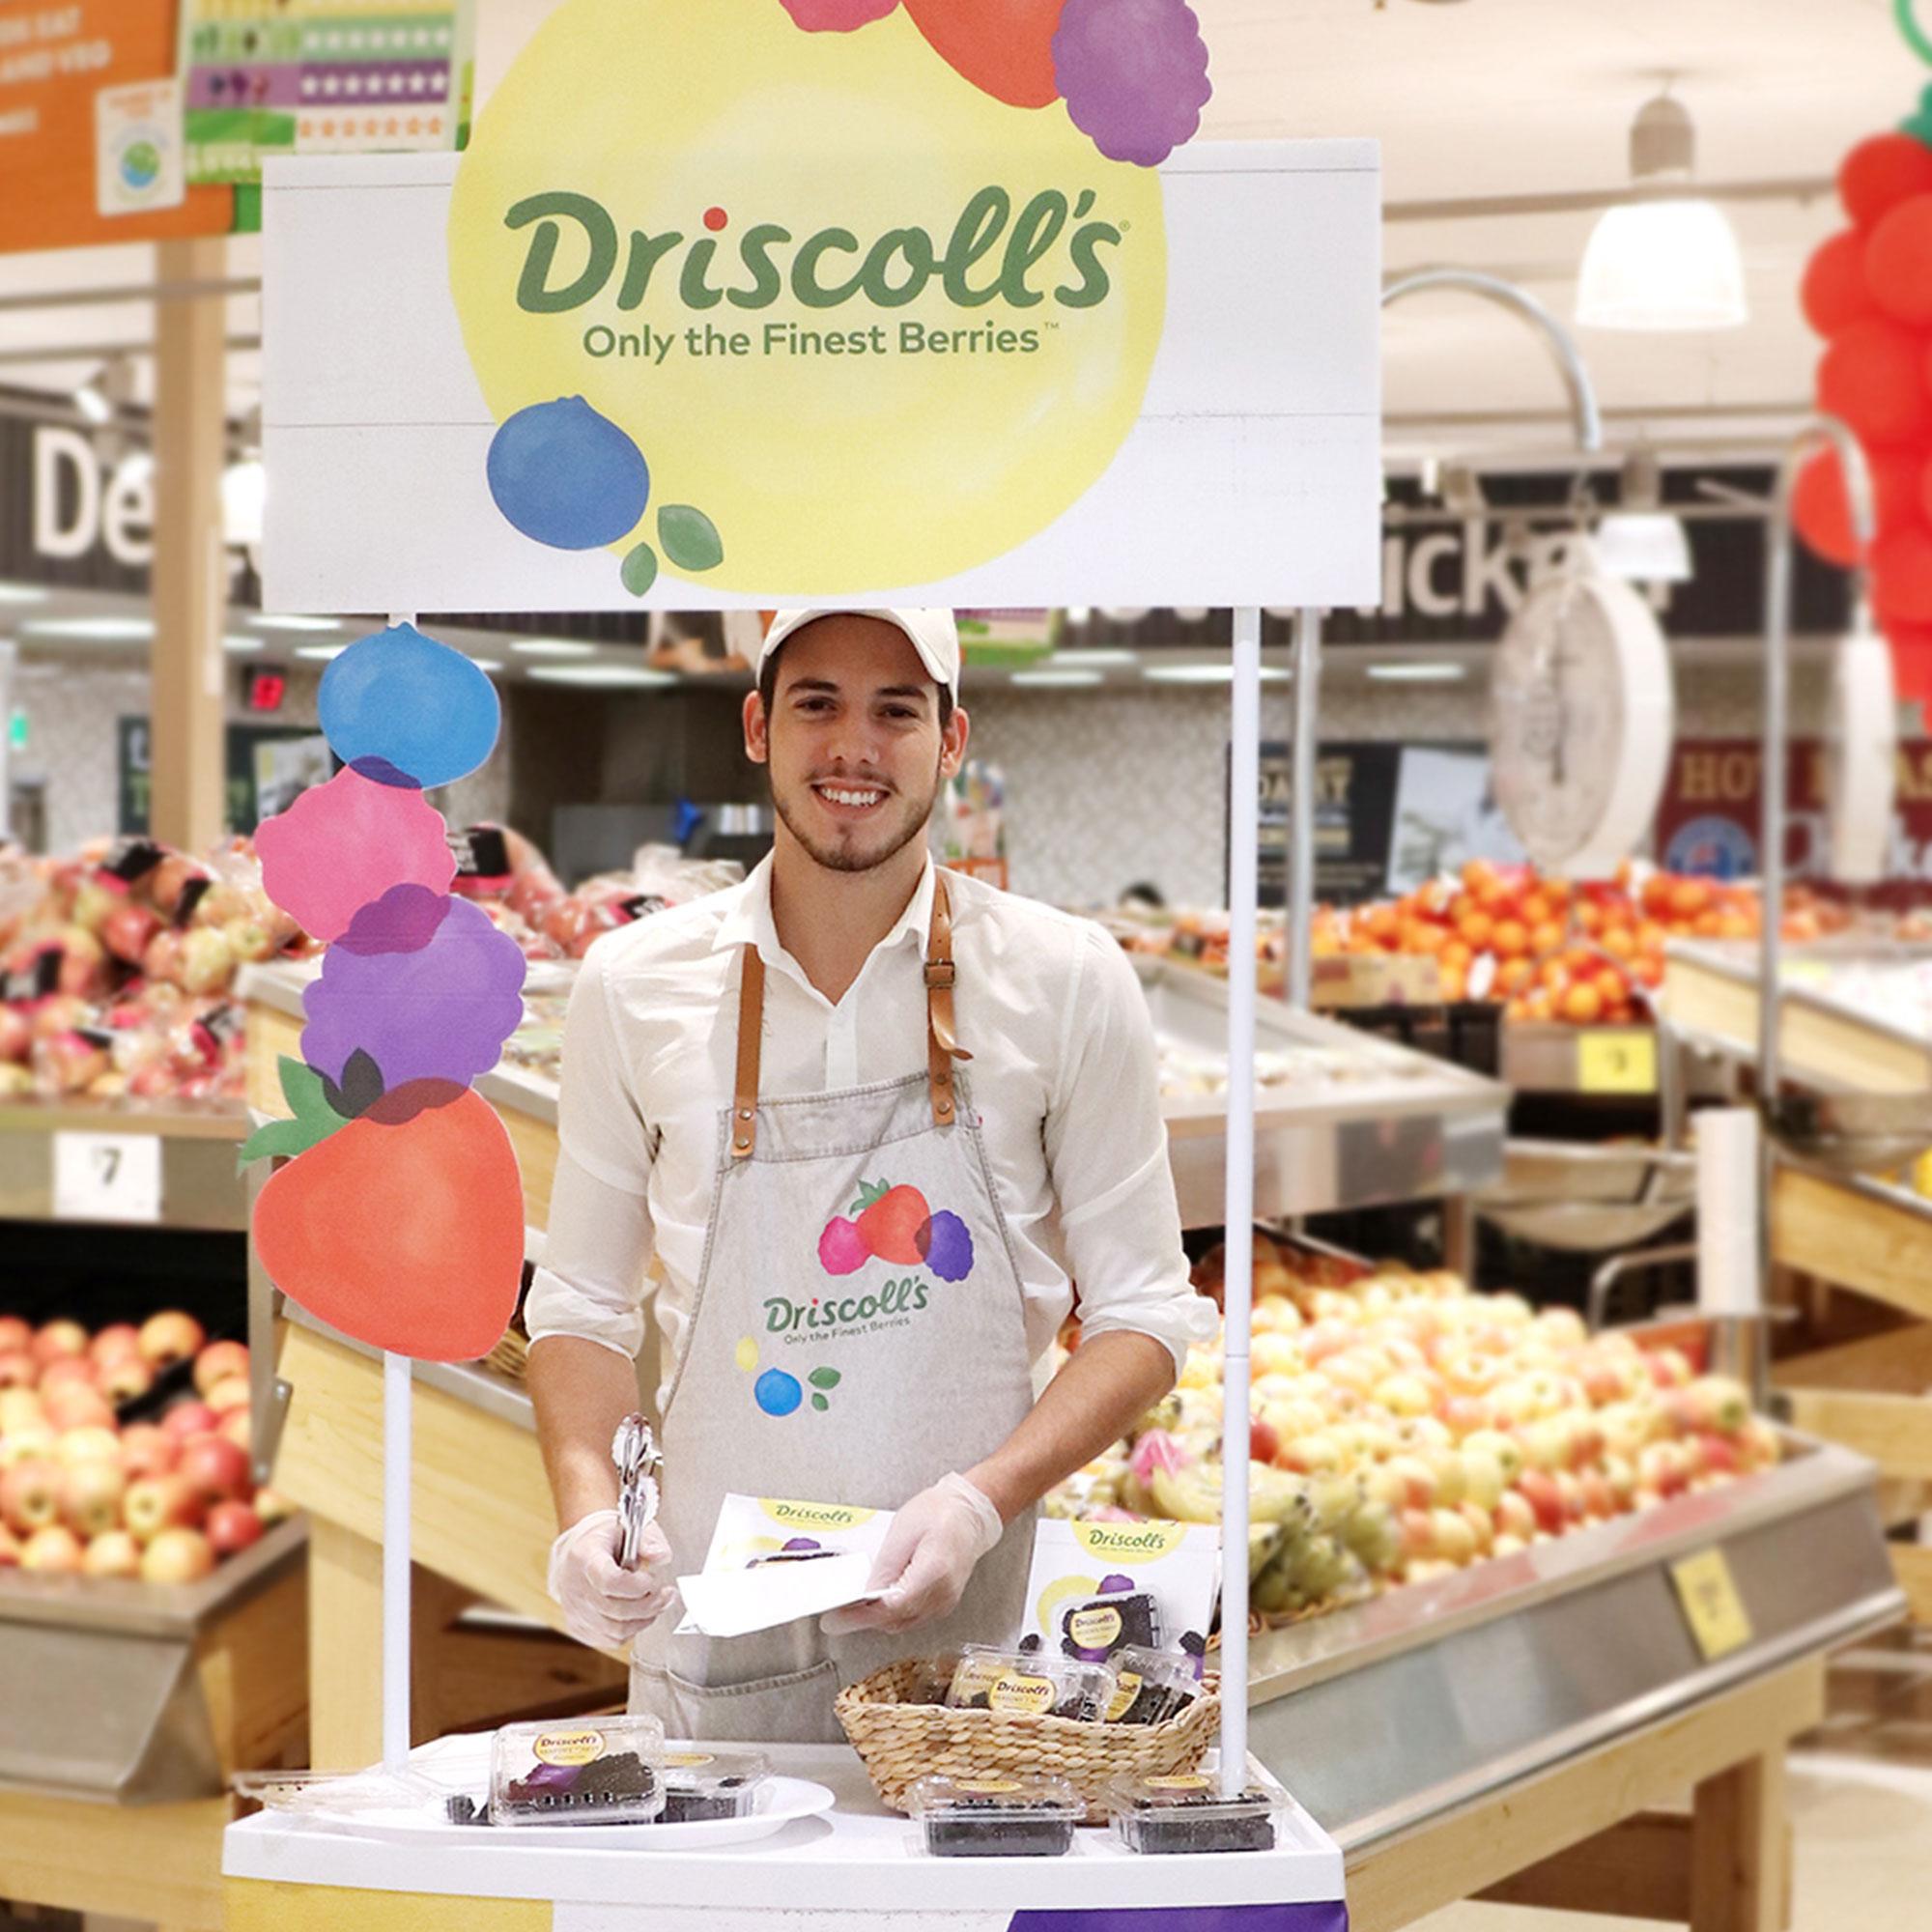 Driscoll's 'Seasons Finest Berries'